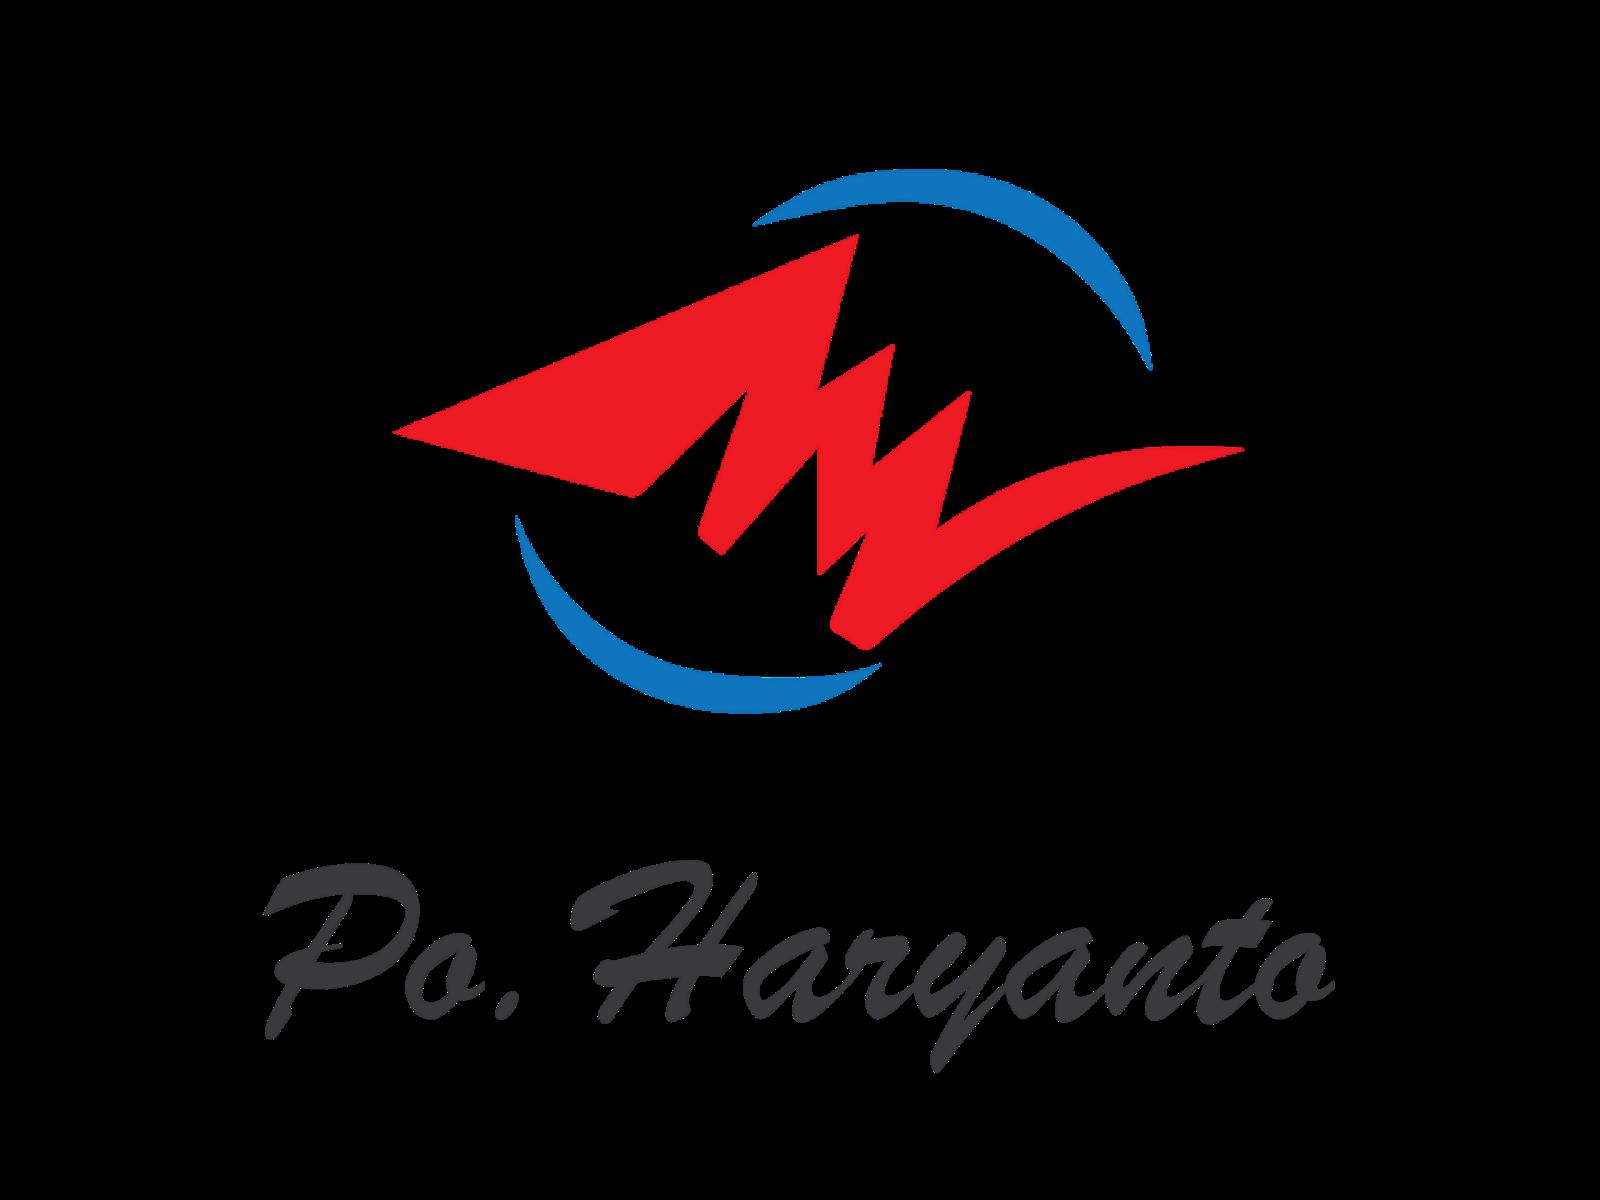 Logo Bus PO Haryanto Format PNG